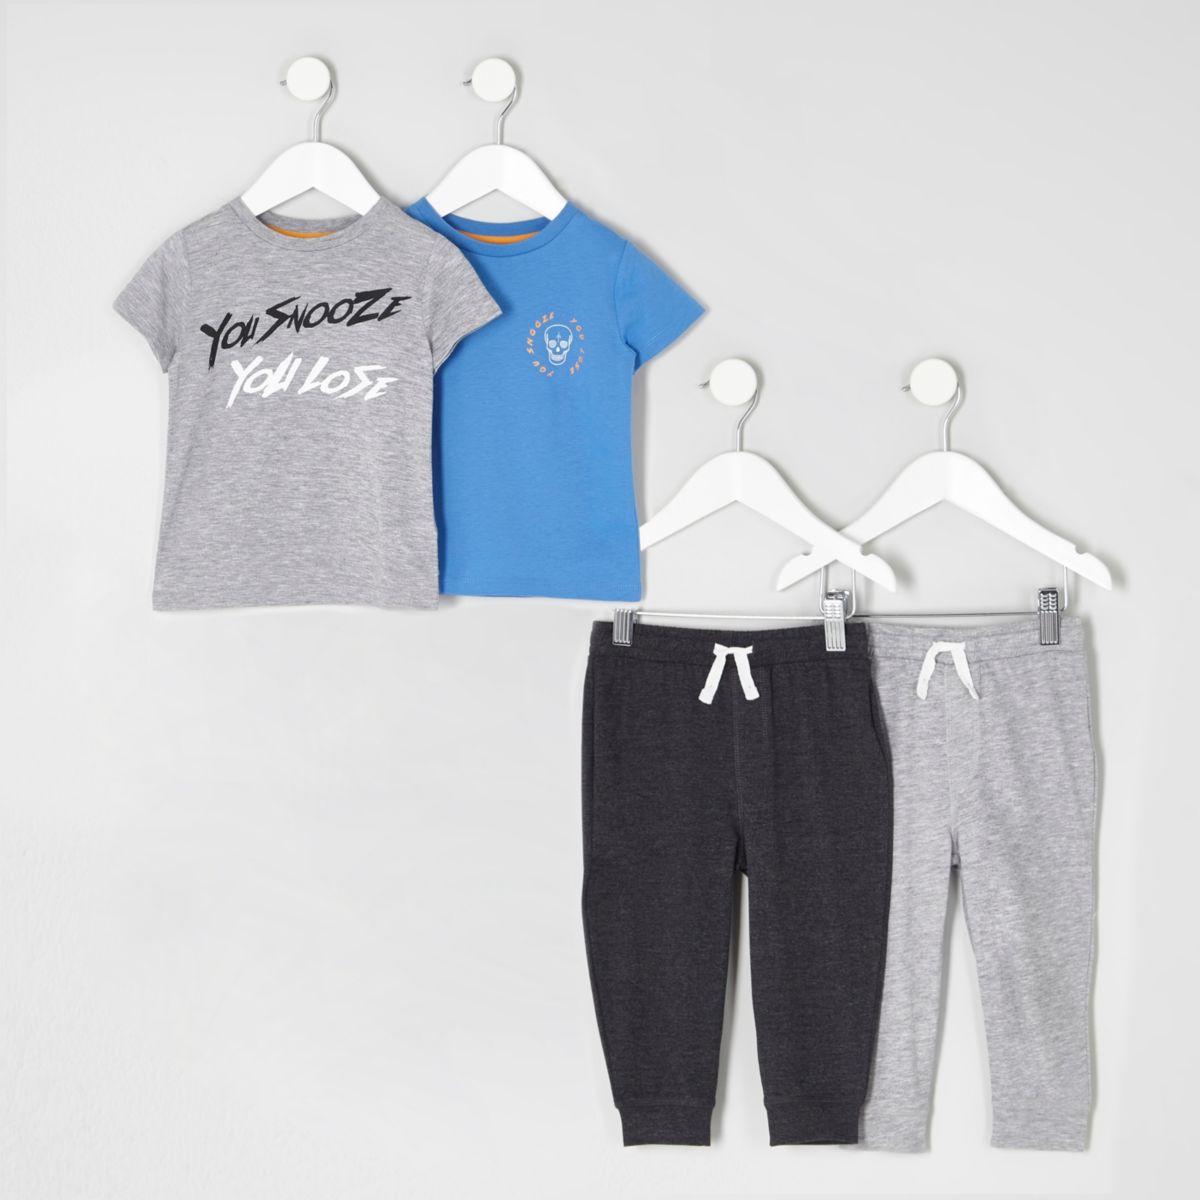 lot de pyjamas imprim s mini gar on pyjamas b b gar on. Black Bedroom Furniture Sets. Home Design Ideas